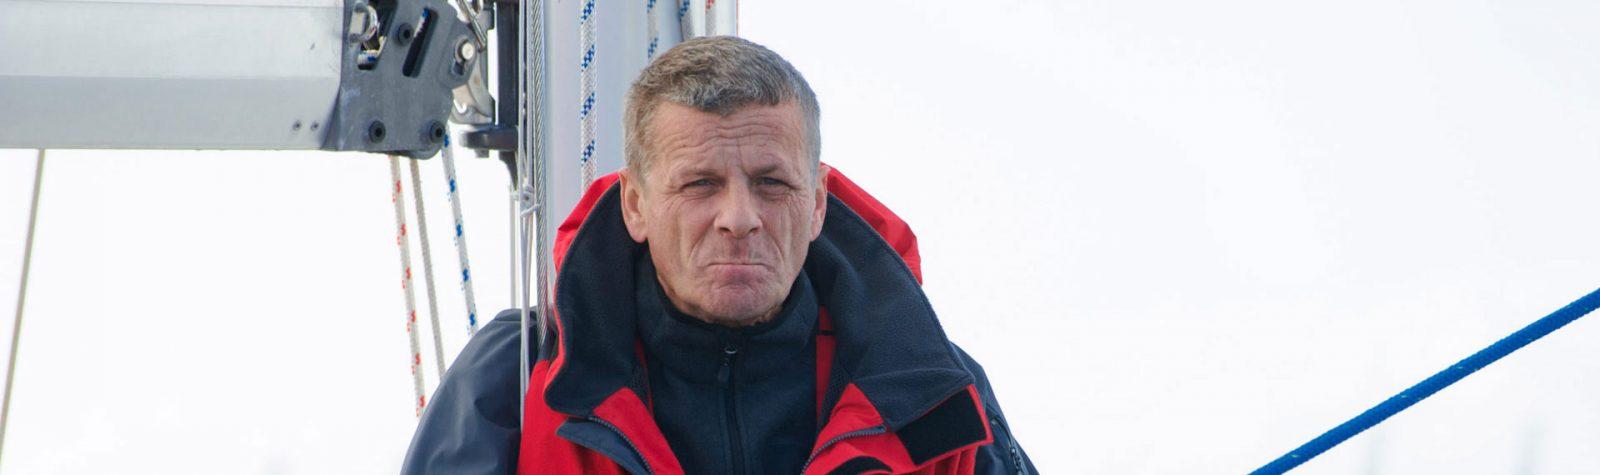 Cichocki Tomasz - kapitan